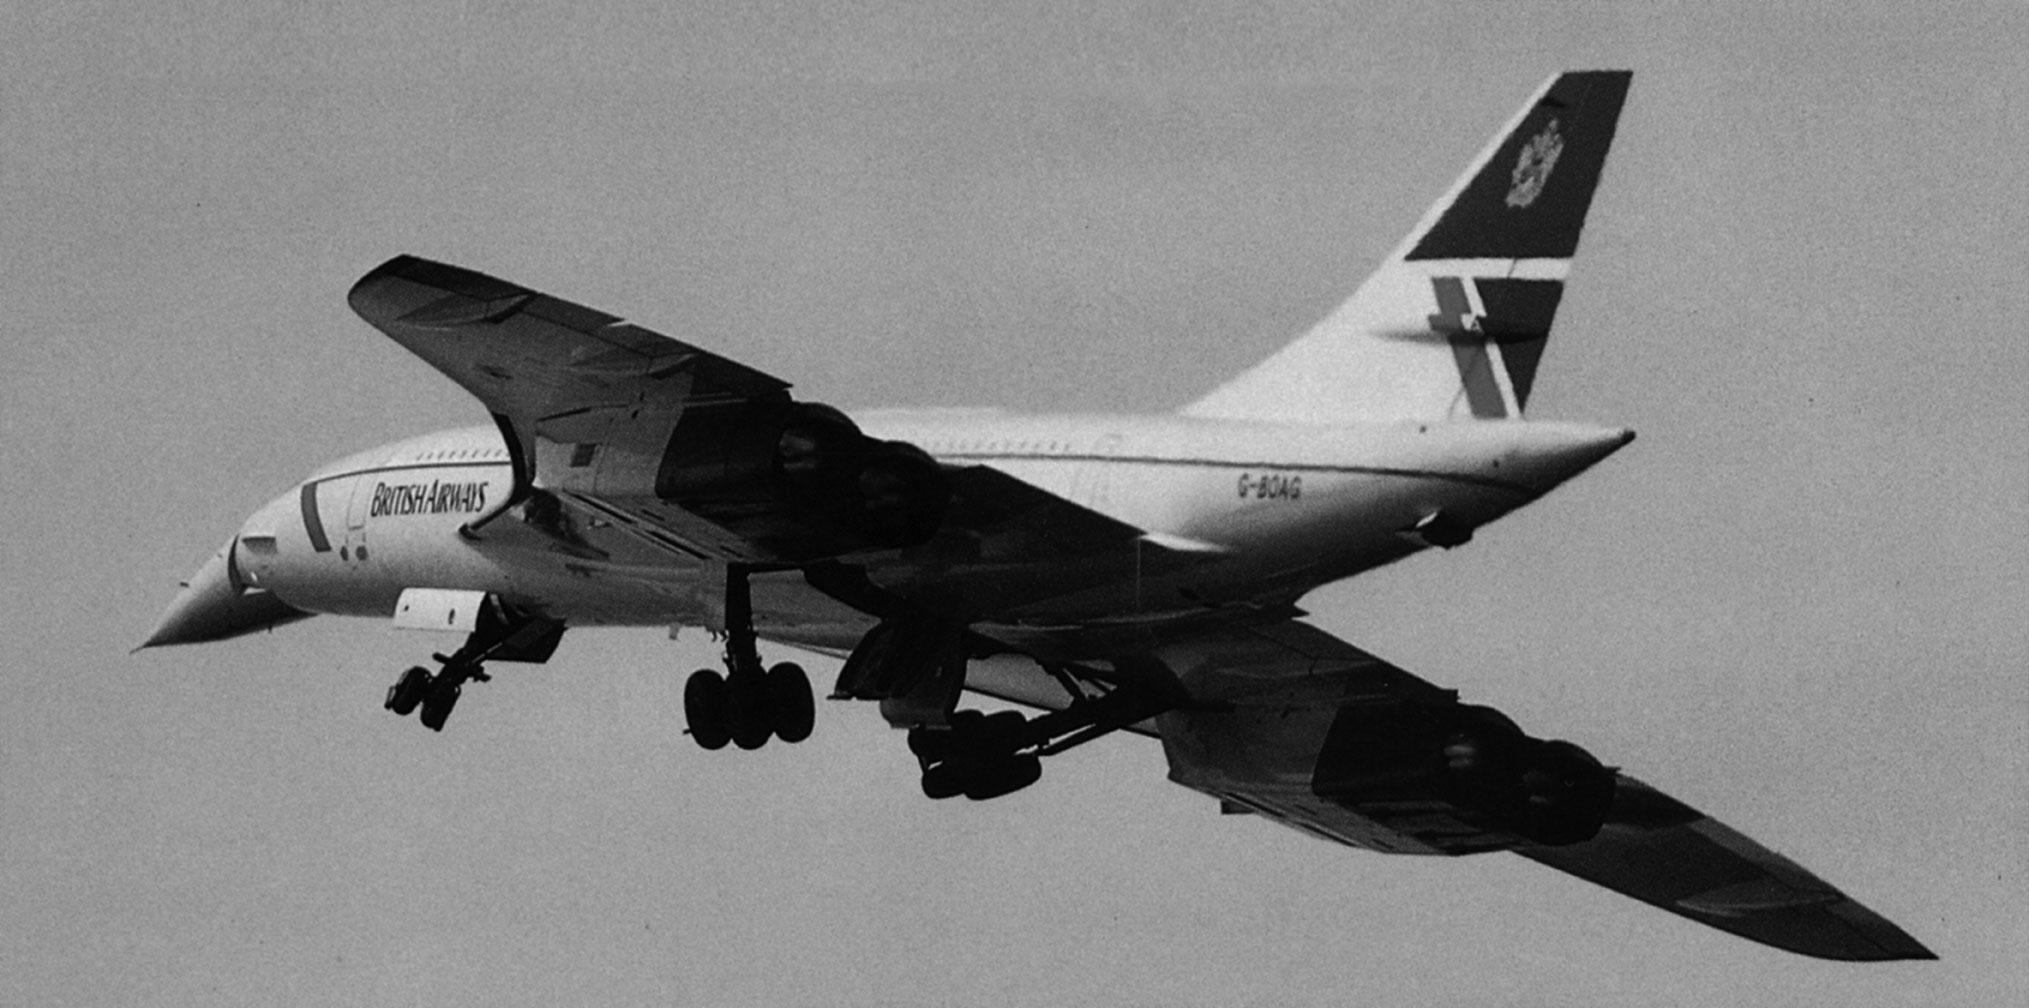 landing-gear-upBW